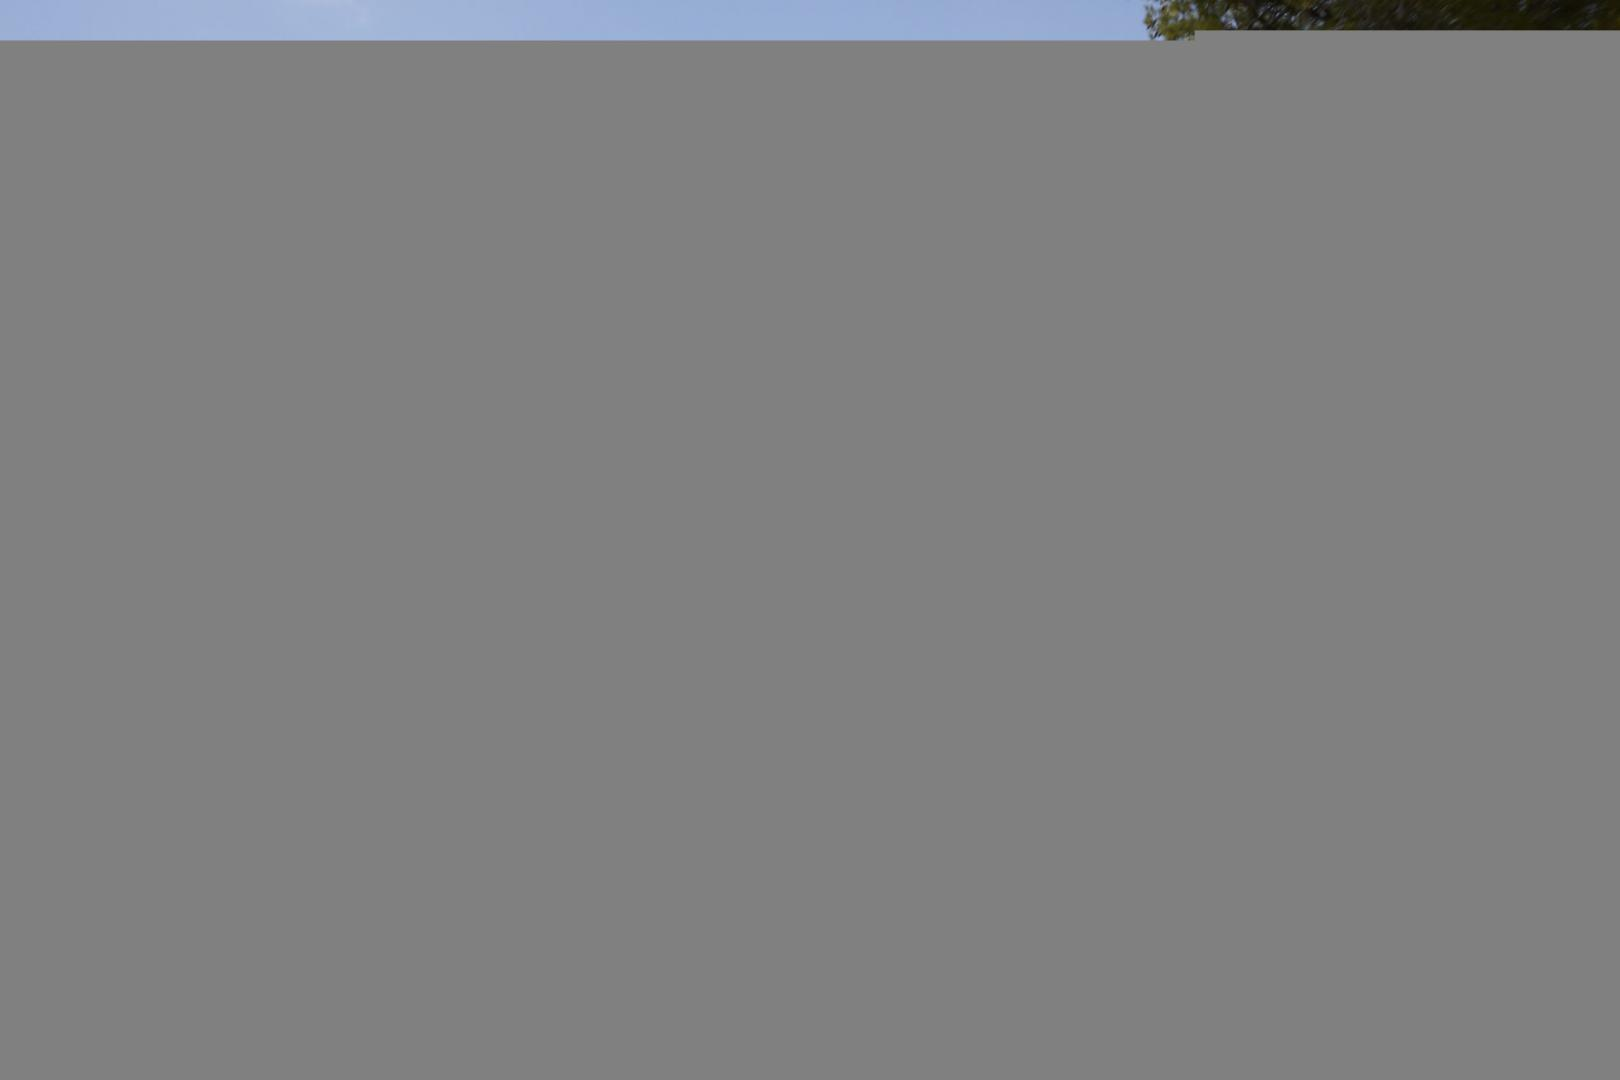 Kia Picanto 1.2 GT-Line